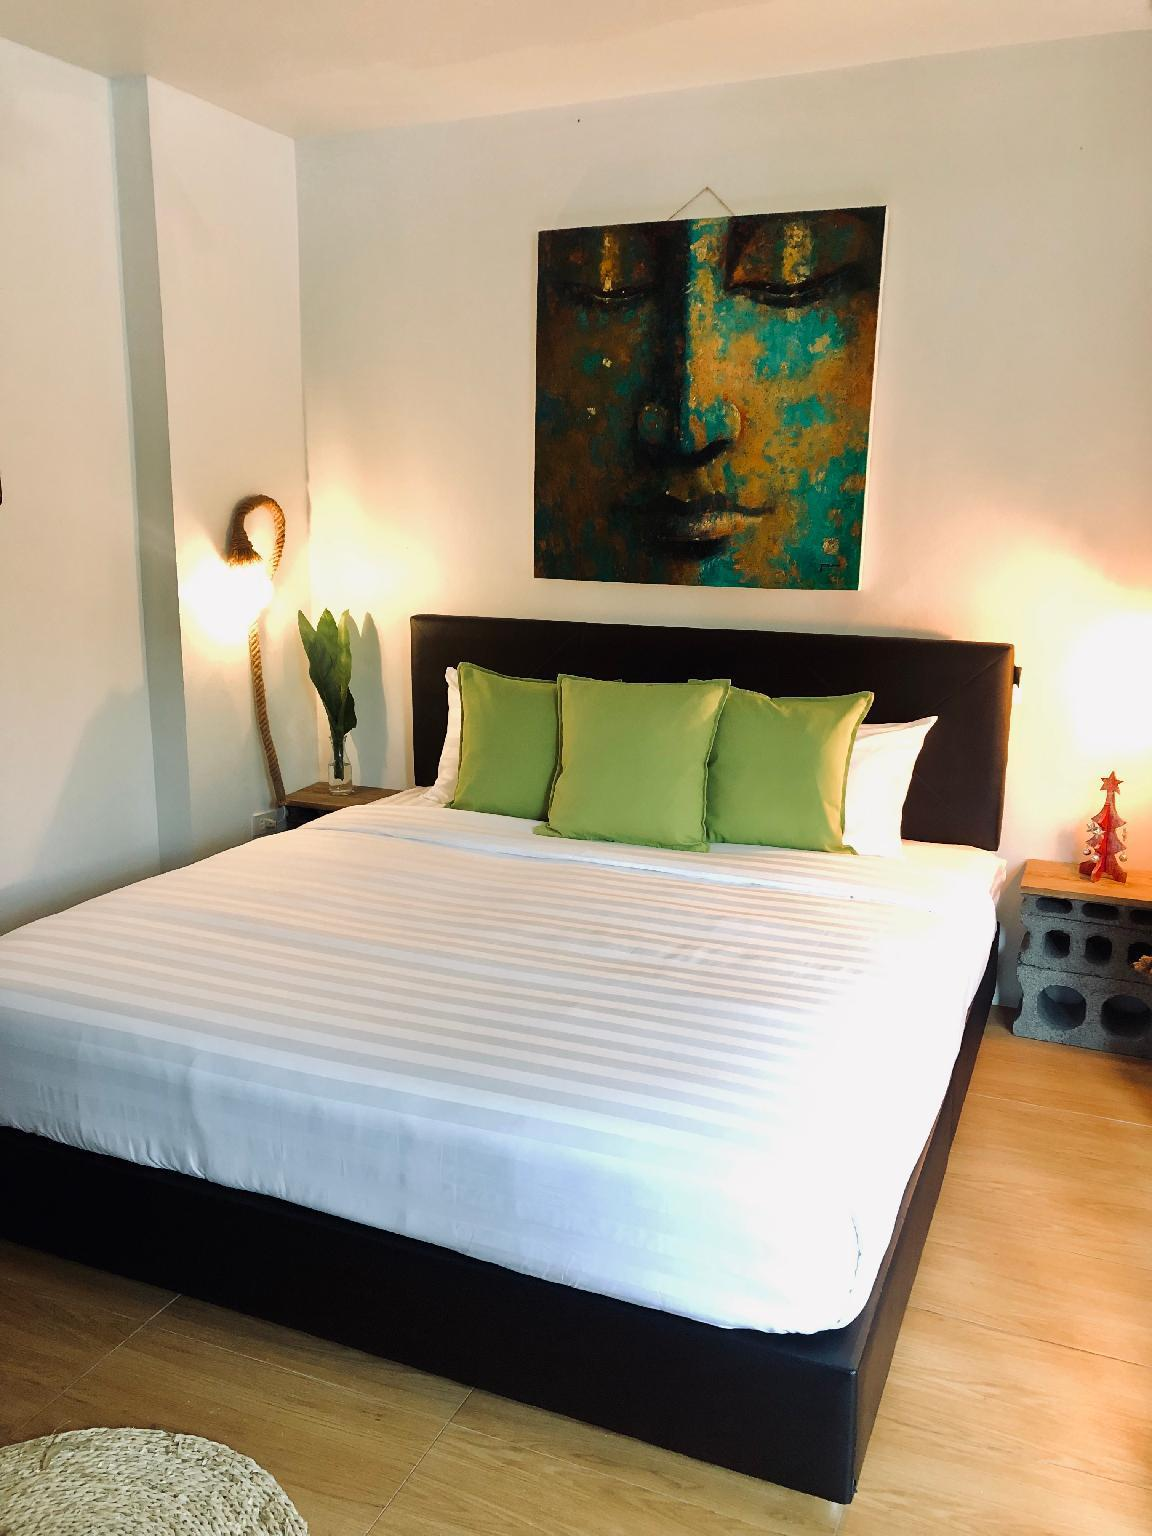 4 Rooms Green in Chaweng Noi สตูดิโอ อพาร์ตเมนต์ 1 ห้องน้ำส่วนตัว ขนาด 30 ตร.ม. – เฉวงน้อย